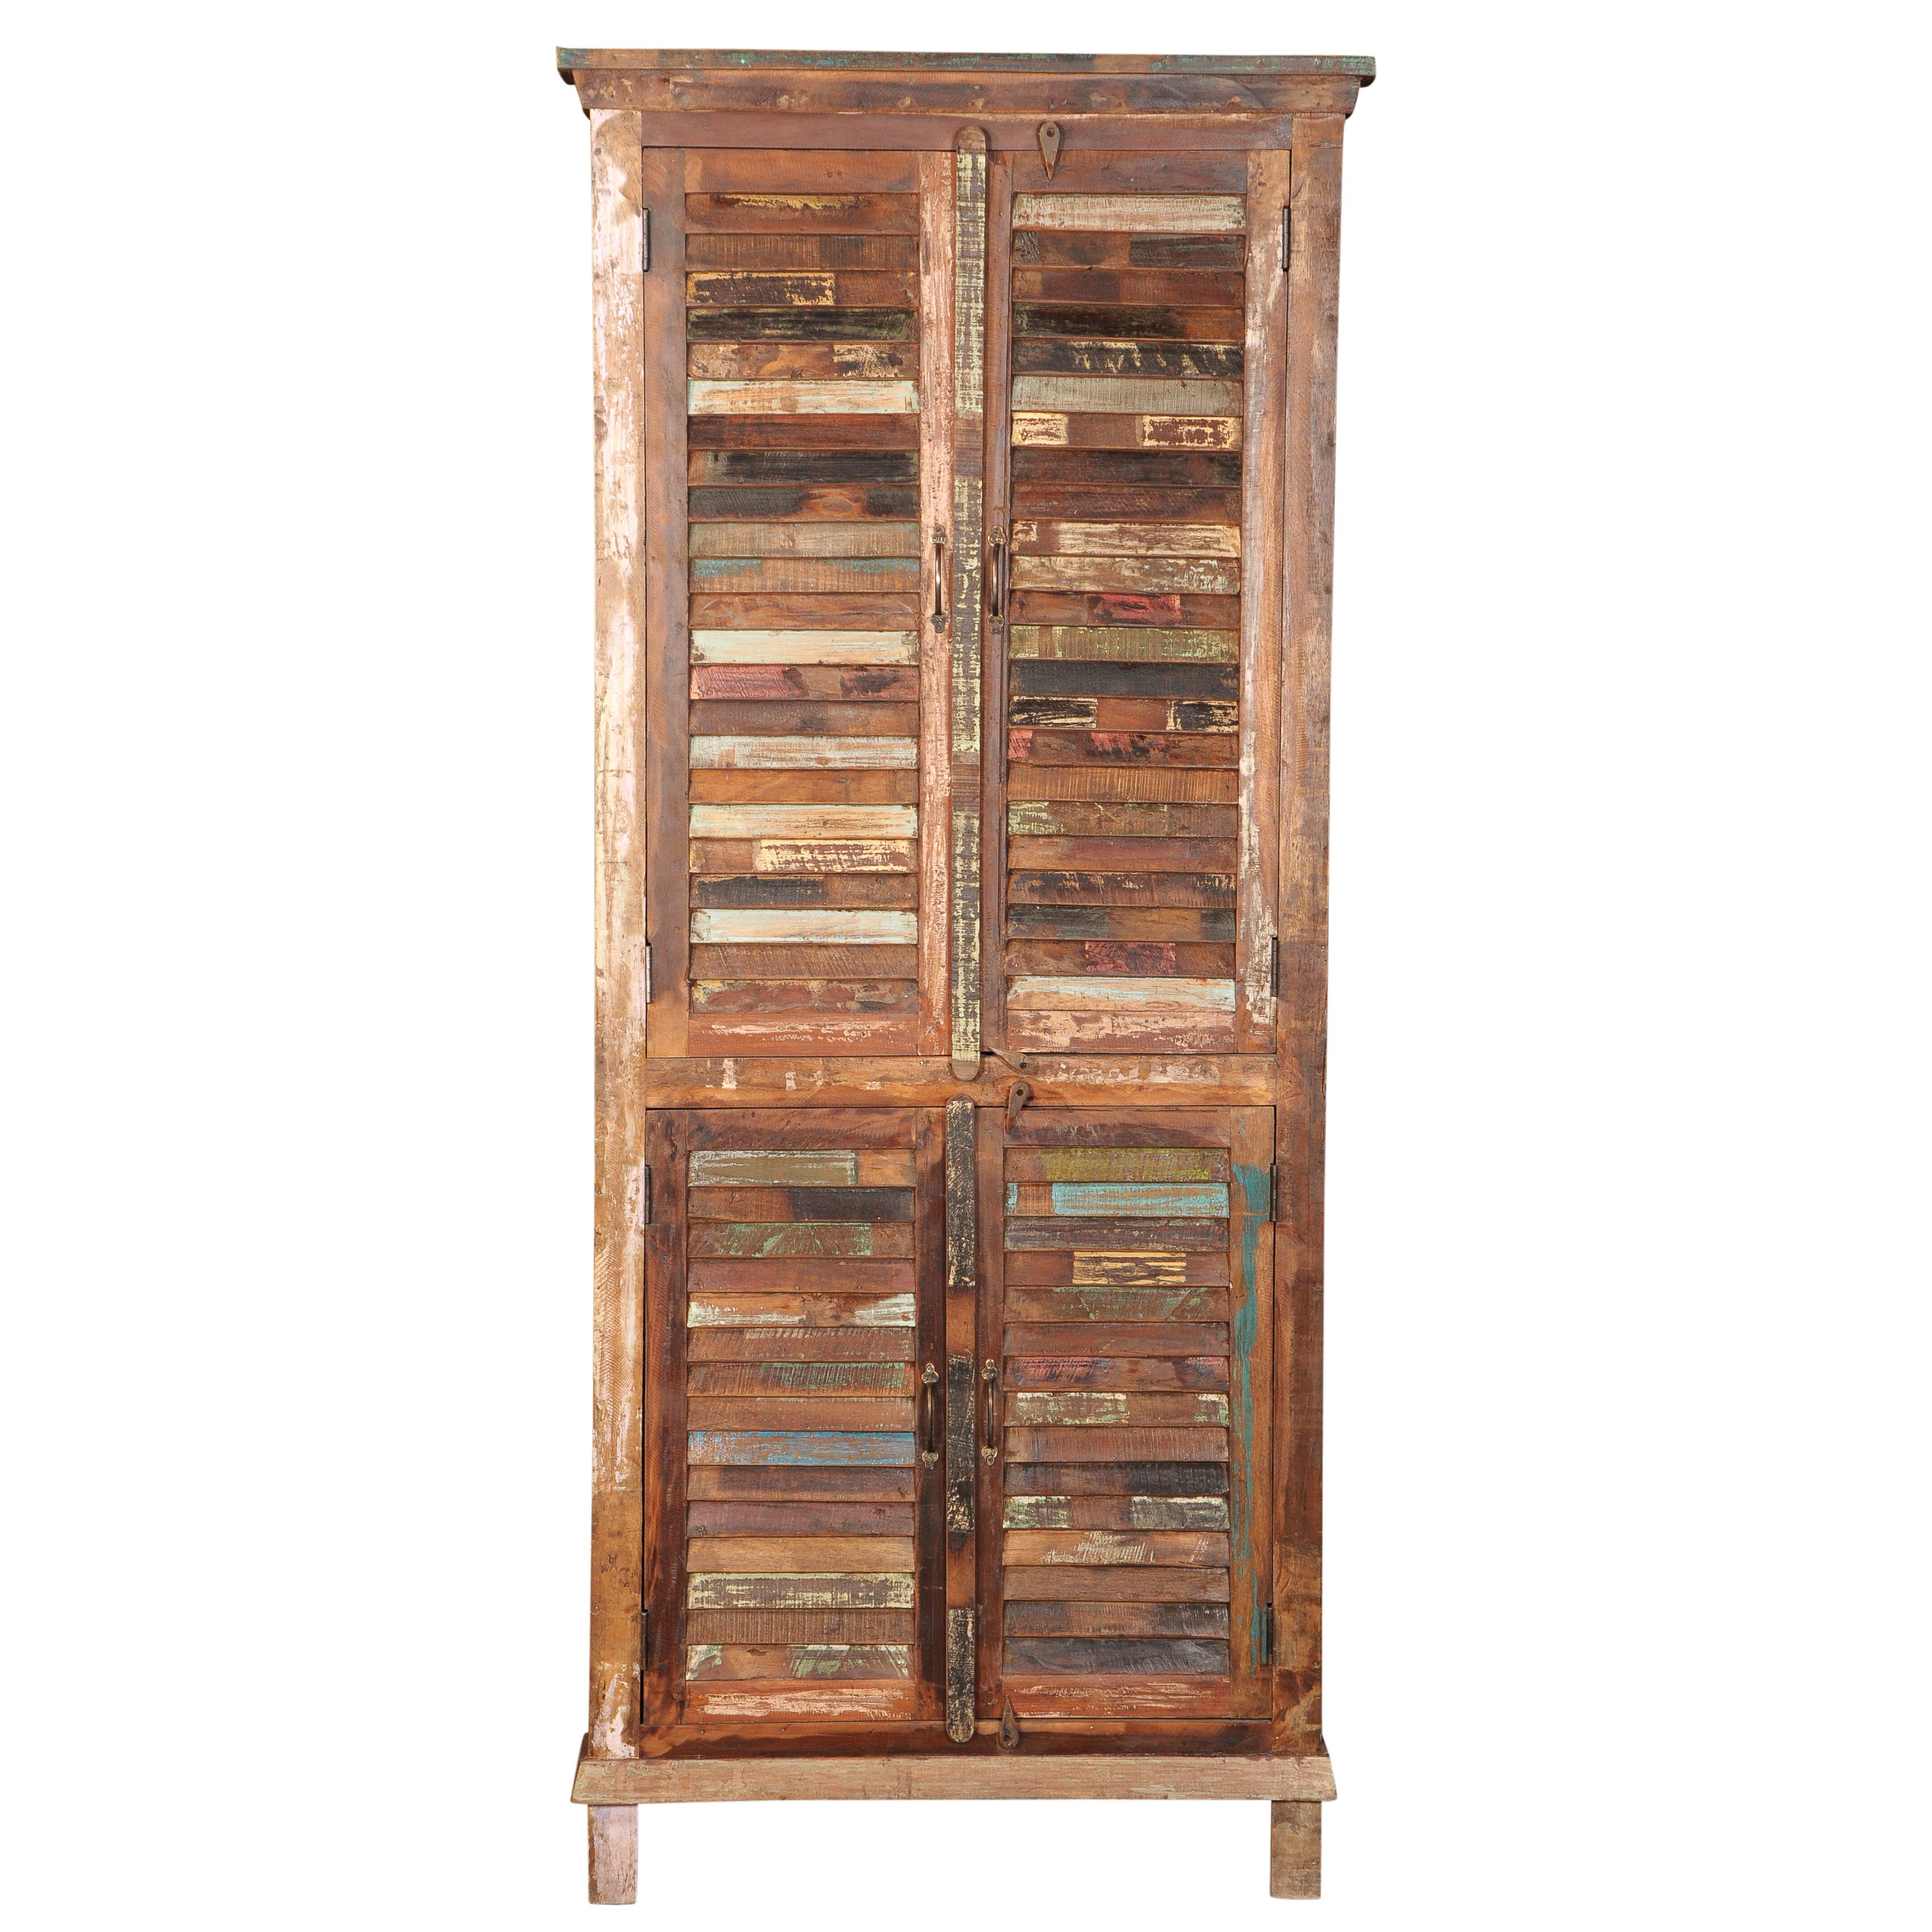 Tall corner cabinets